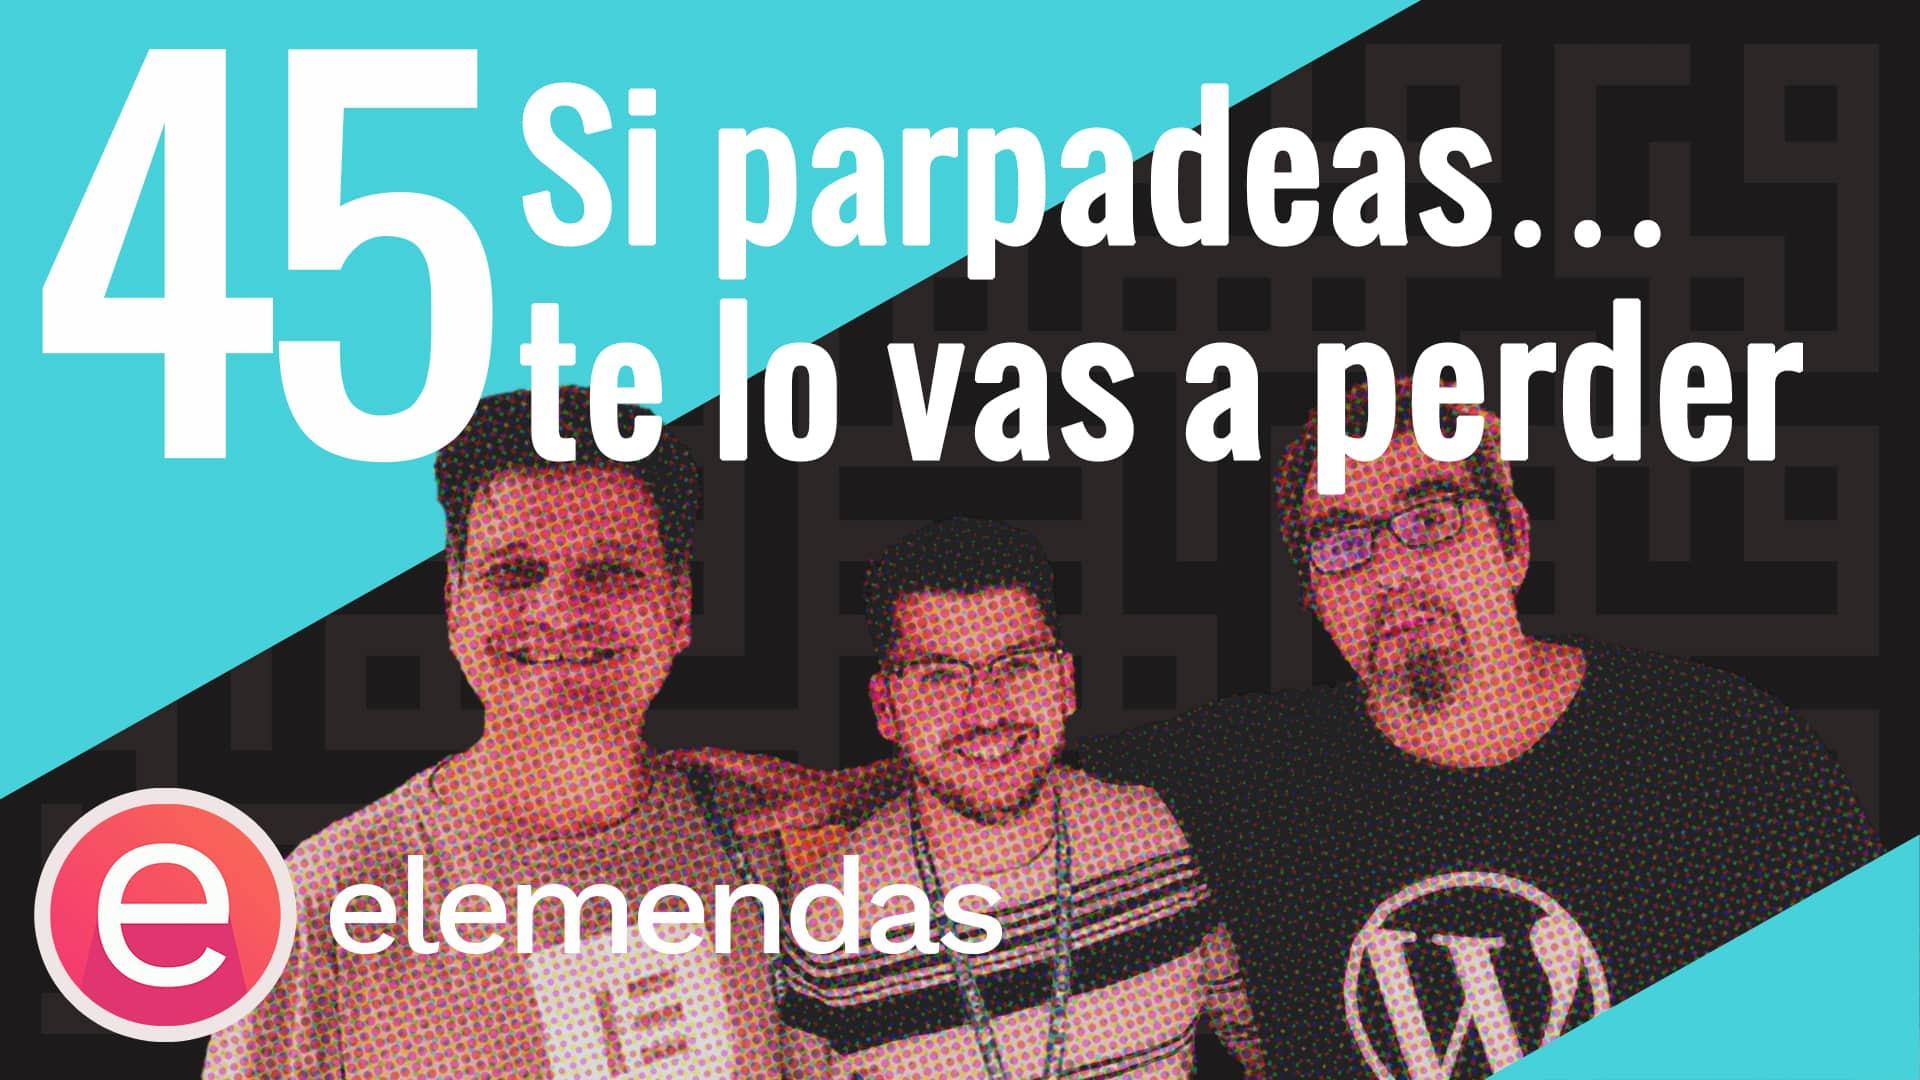 podcast-45-elemendas-elementor-en-español-blog